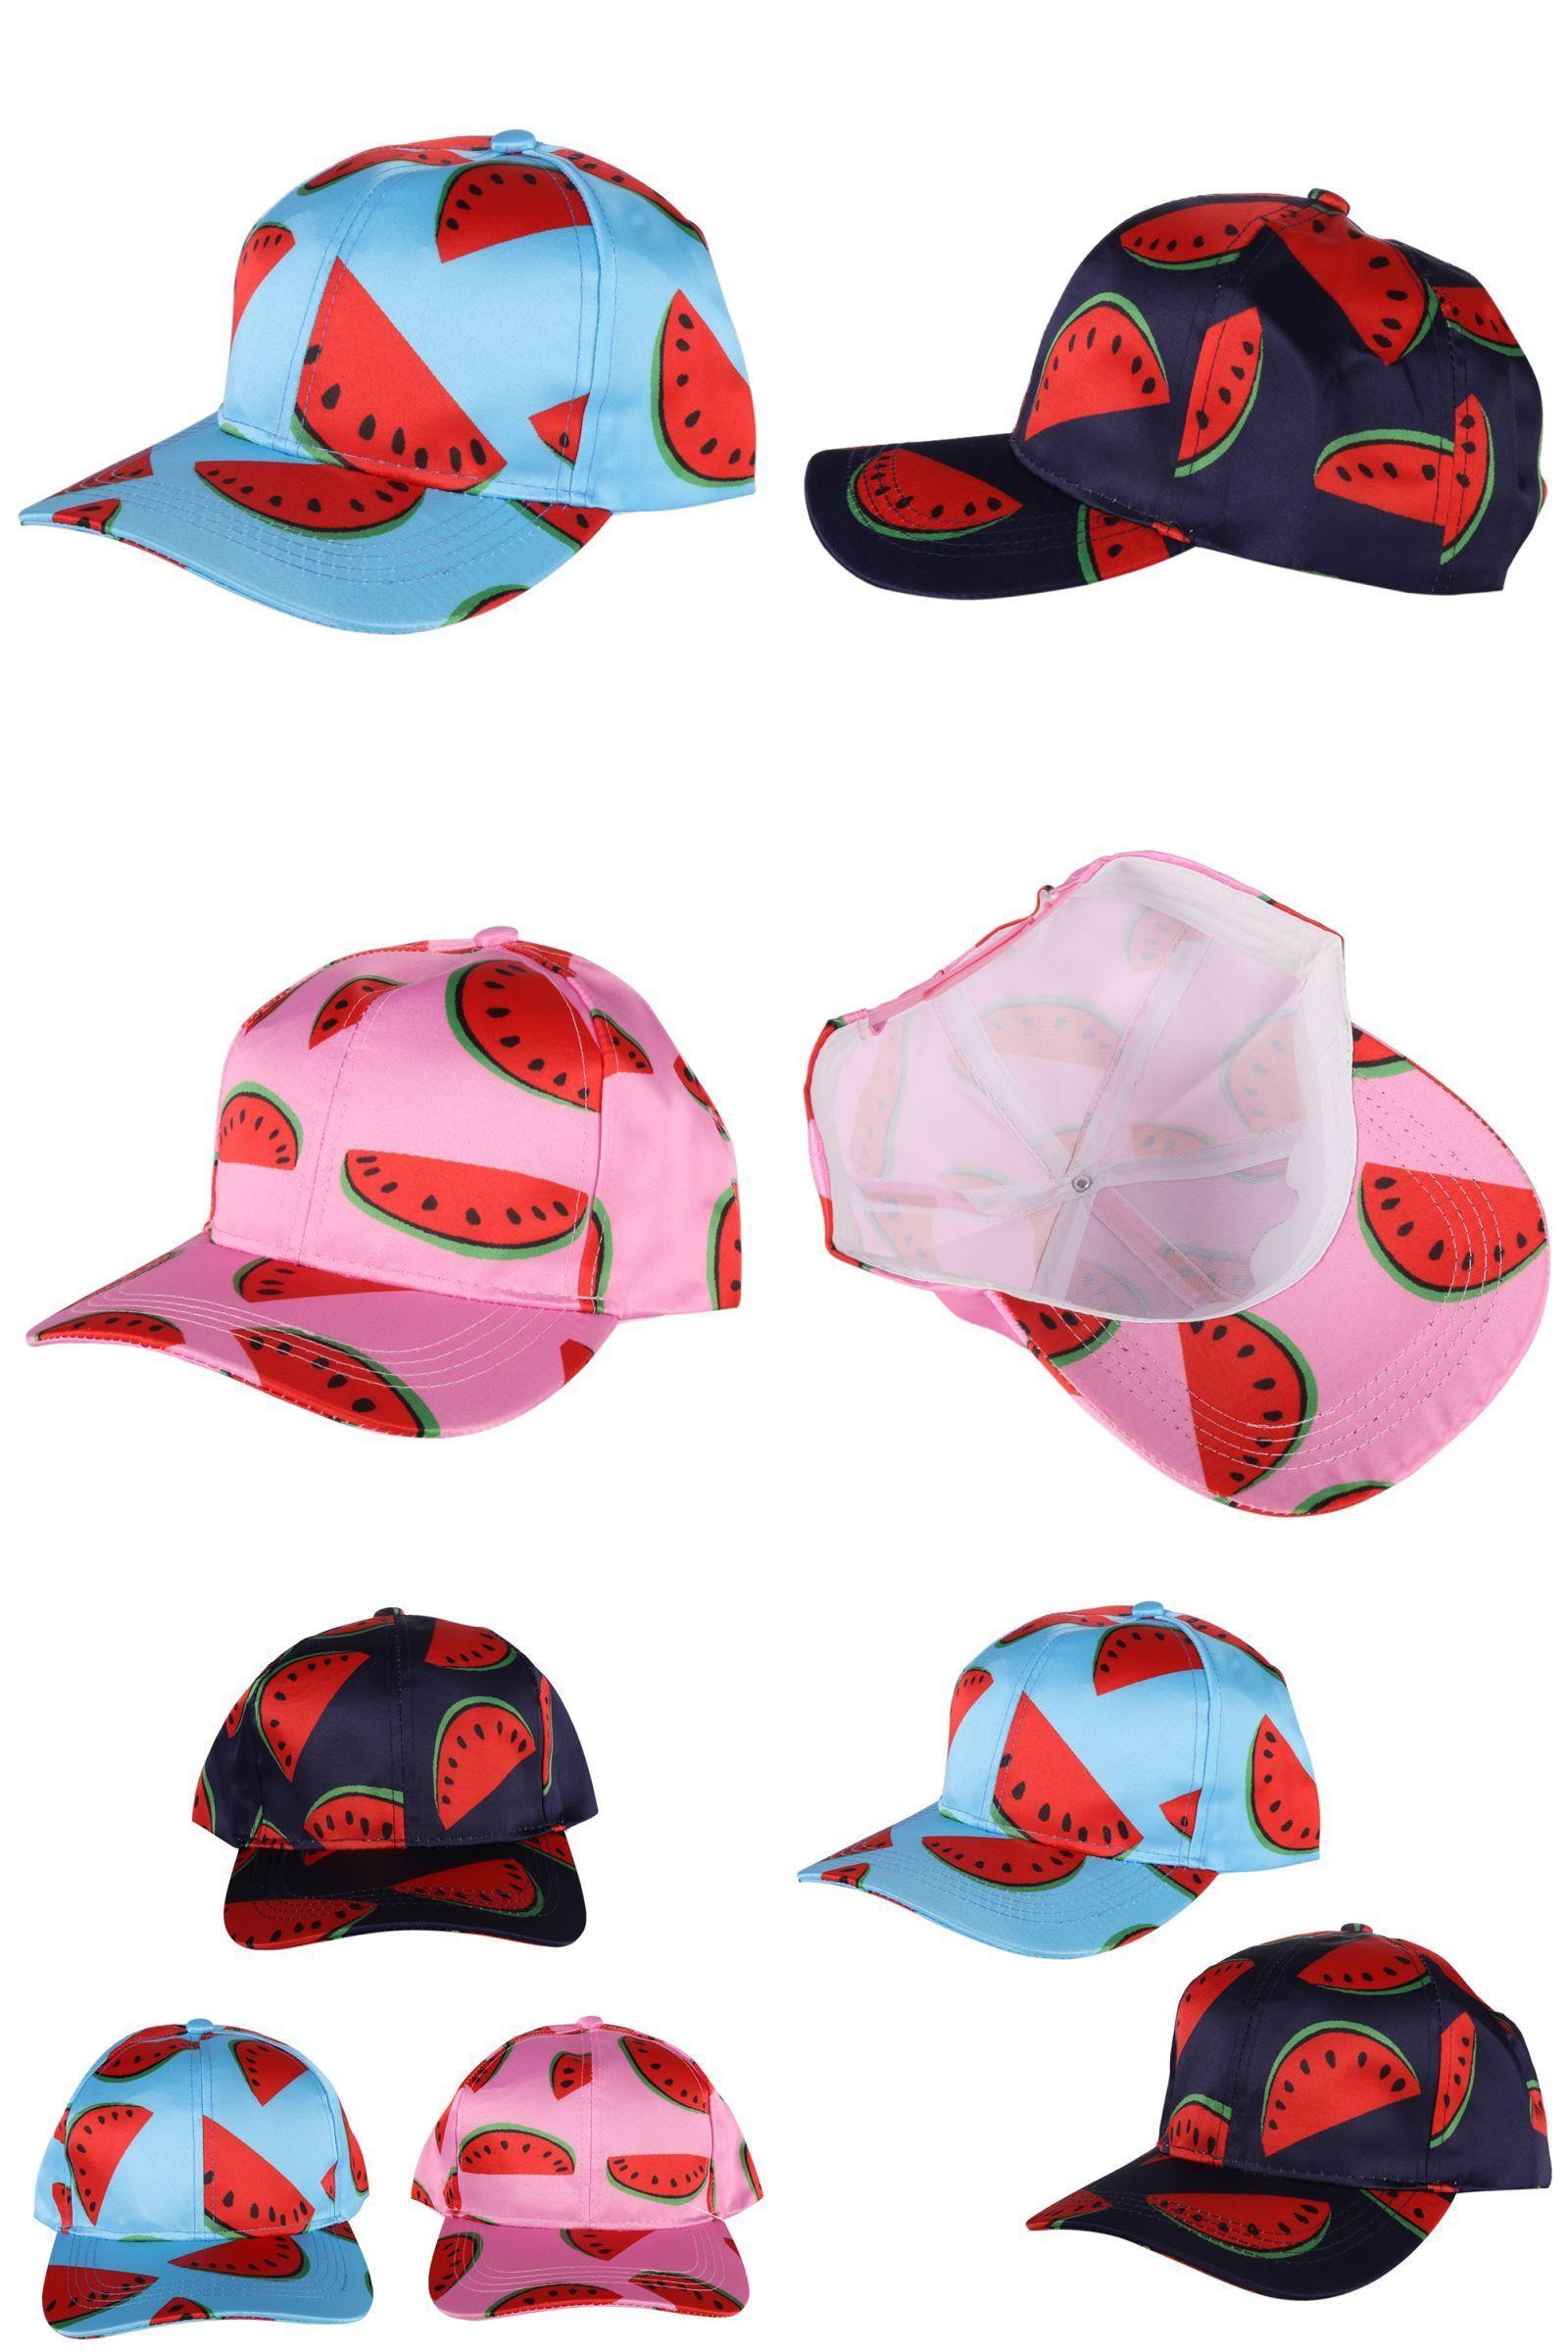 81404850e56  Visit to Buy  New Summer Watermelon Printed Baseball Caps Unisex Women Men  Hip Hop